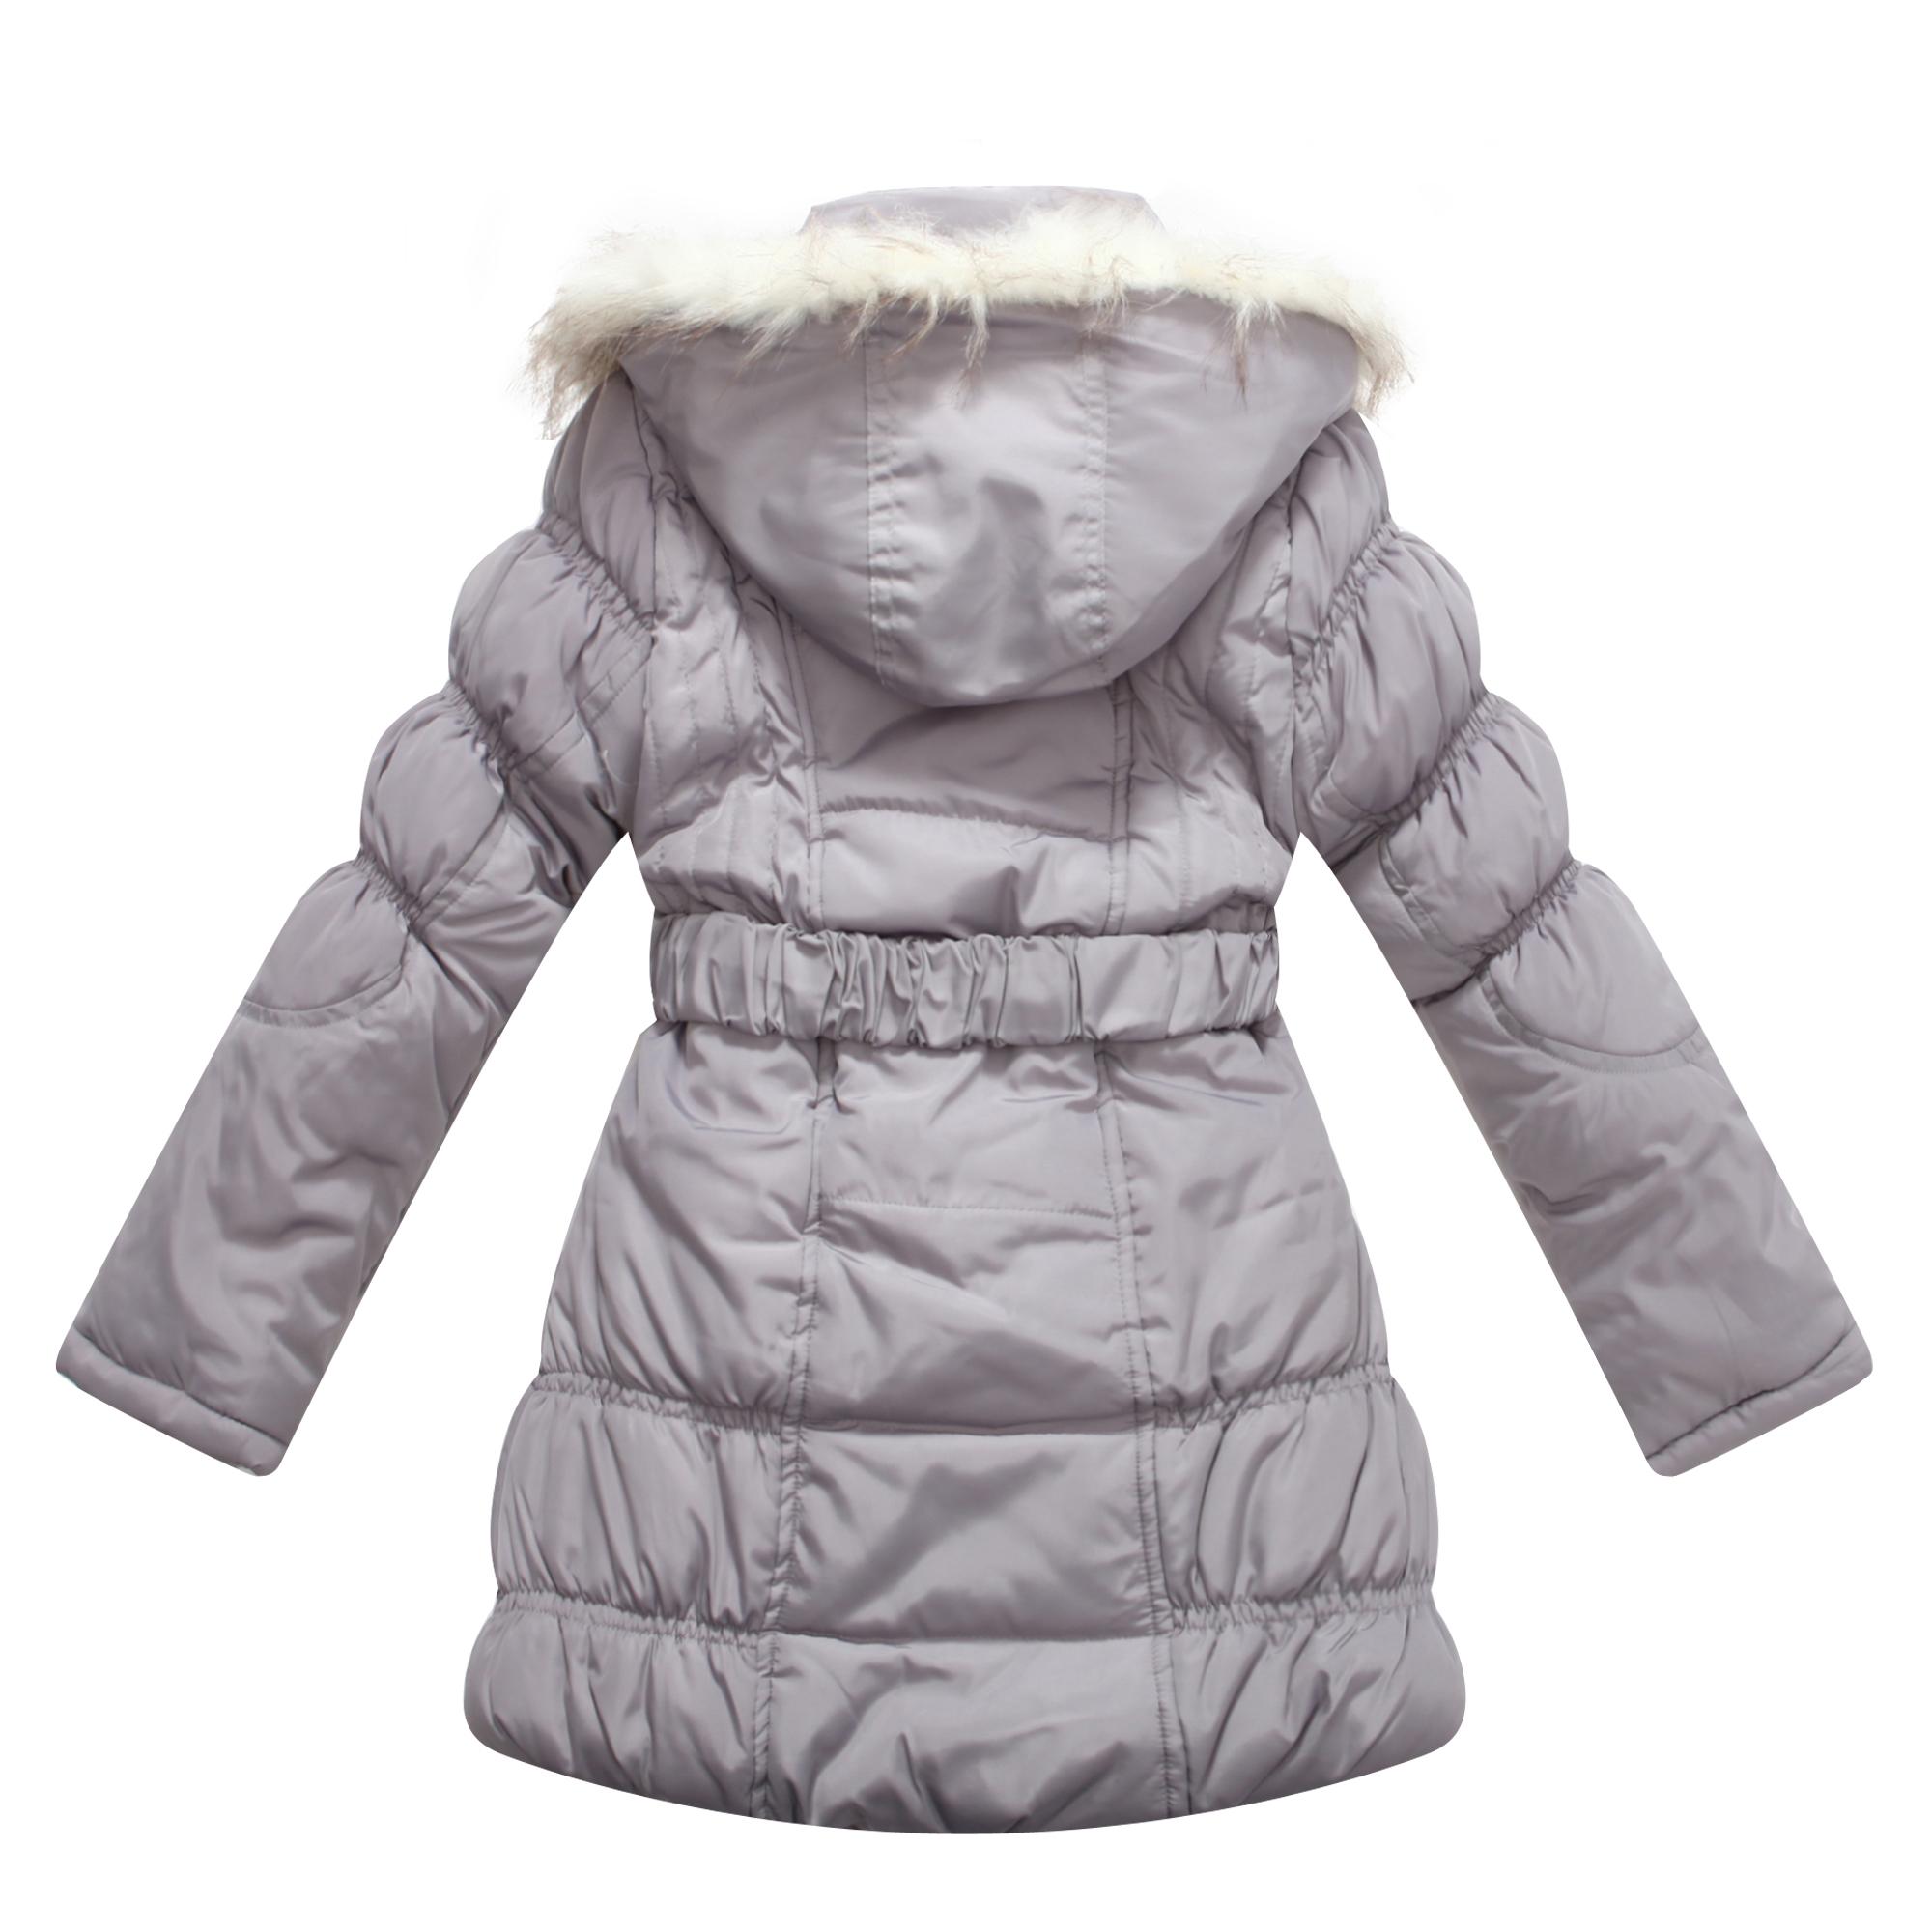 4c8adcc08319 Richie House - Richie House Girls Grey Fur Hood Belt Padded Winter ...